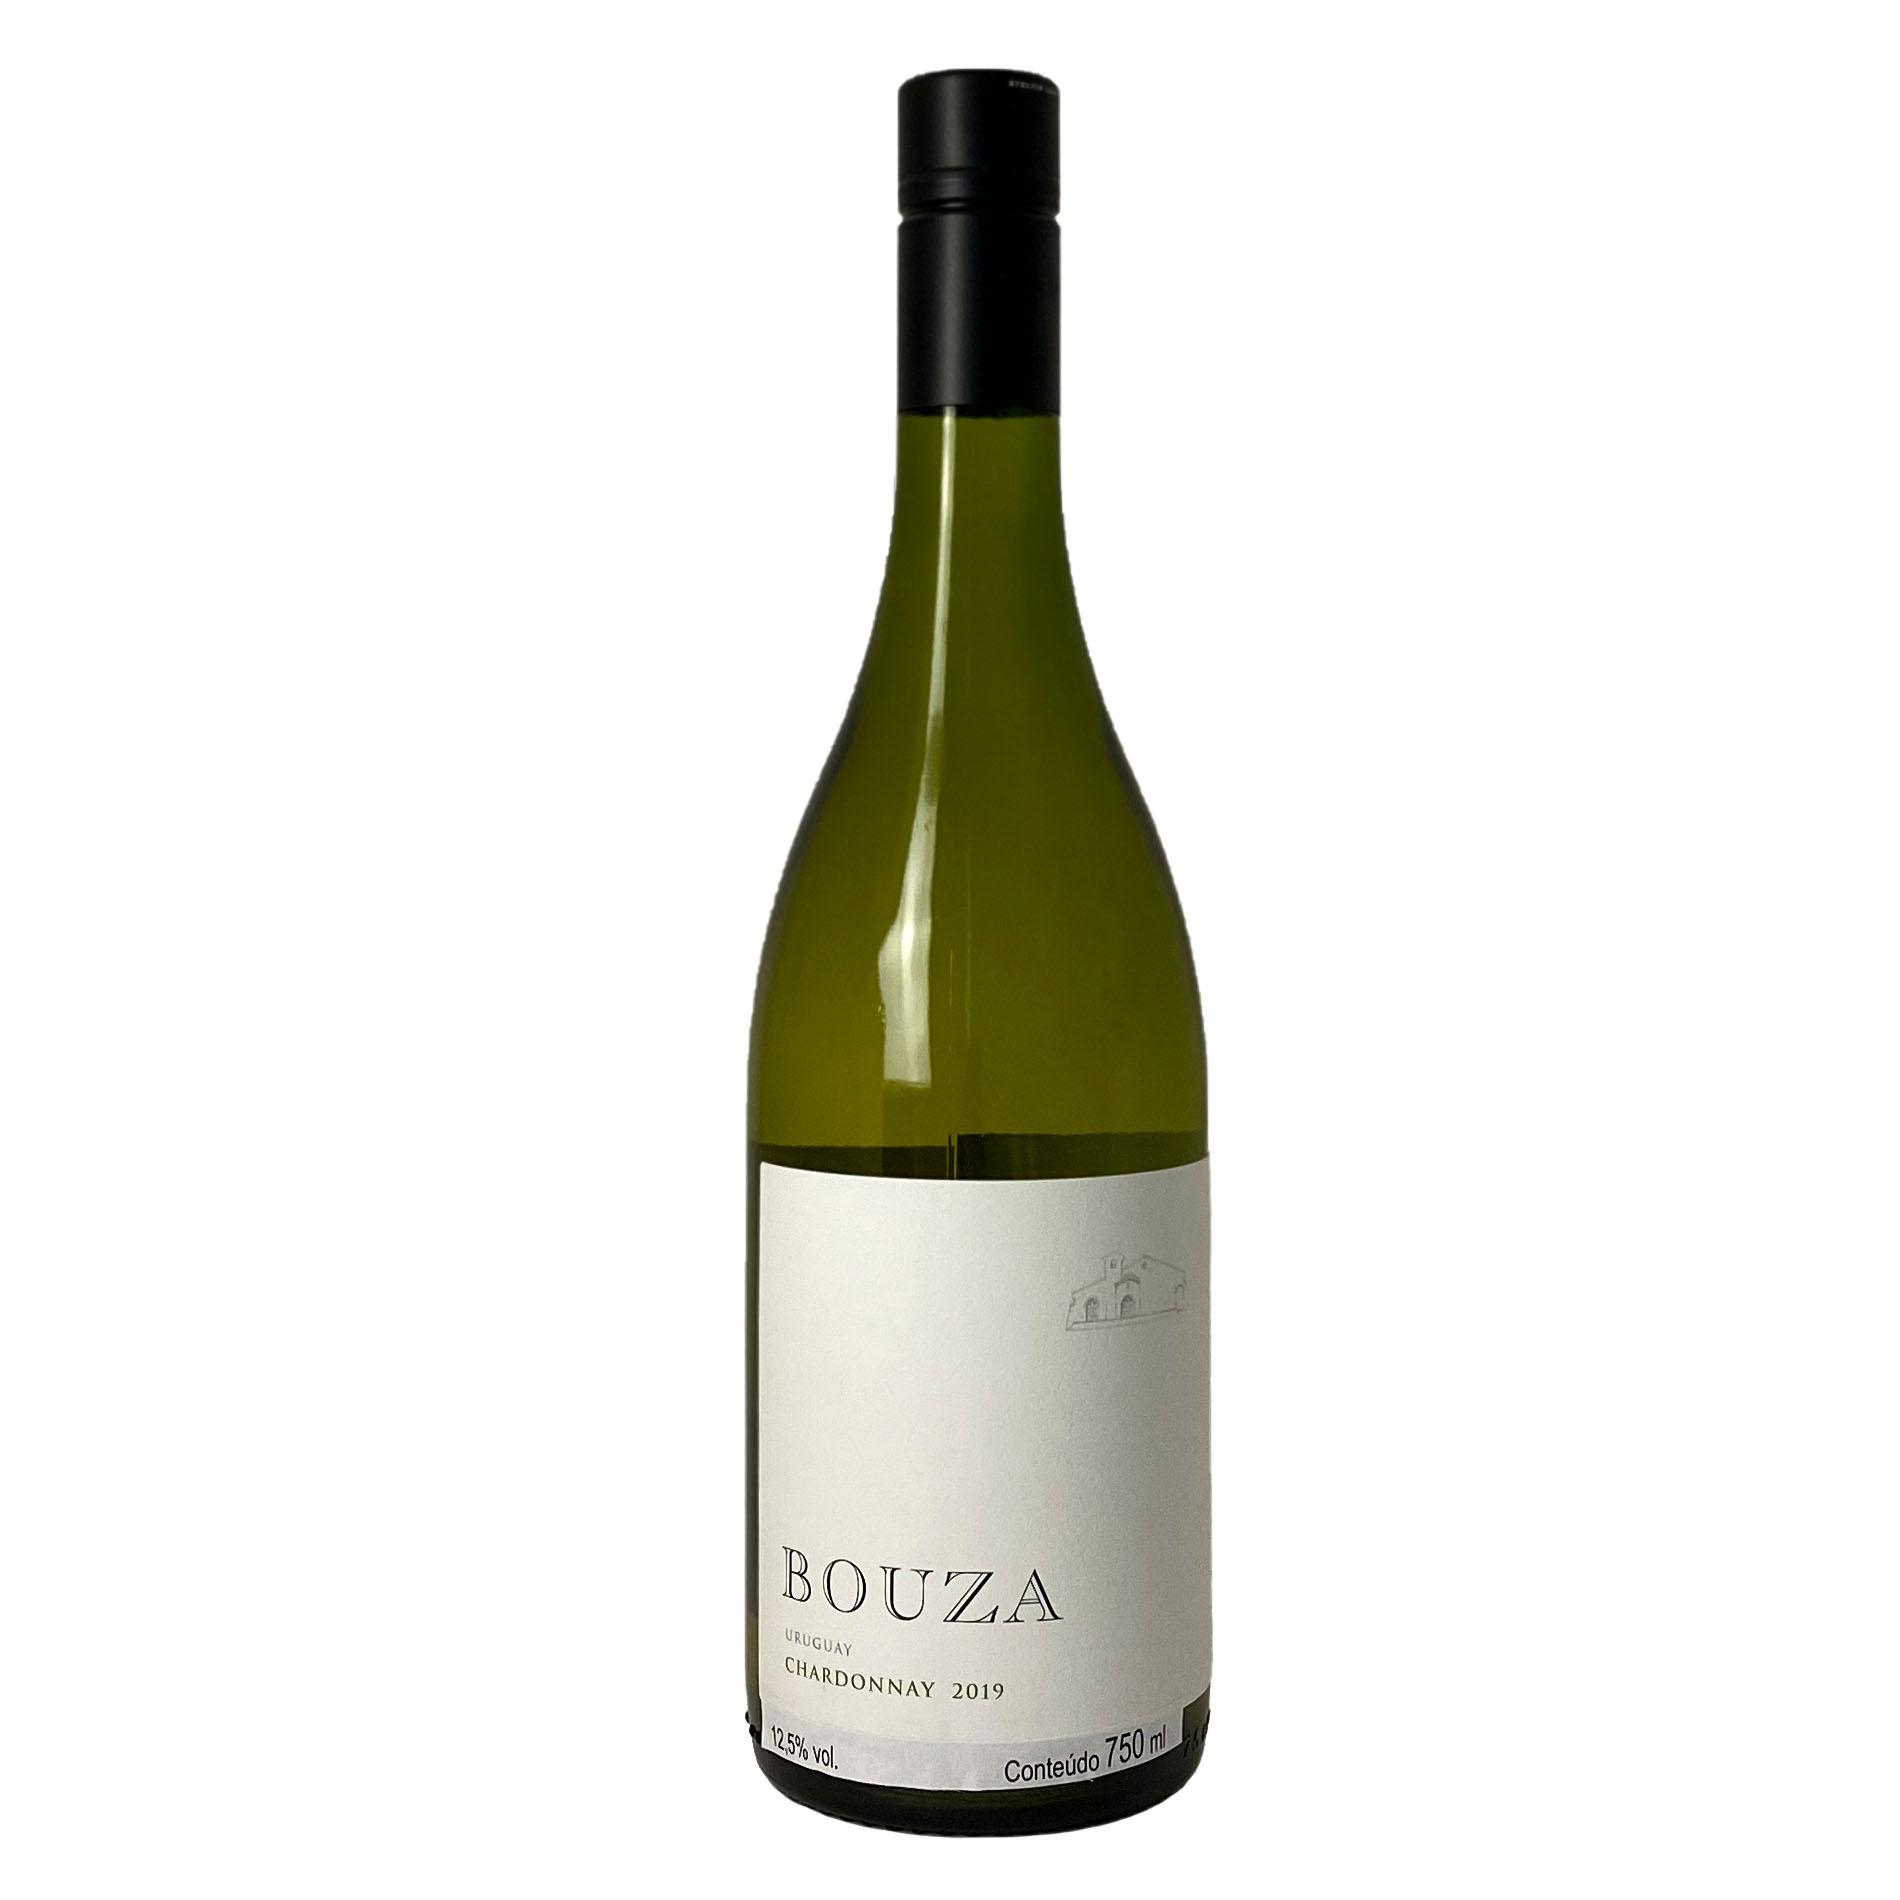 Bodega Bouza Chardonay  - Vinerize